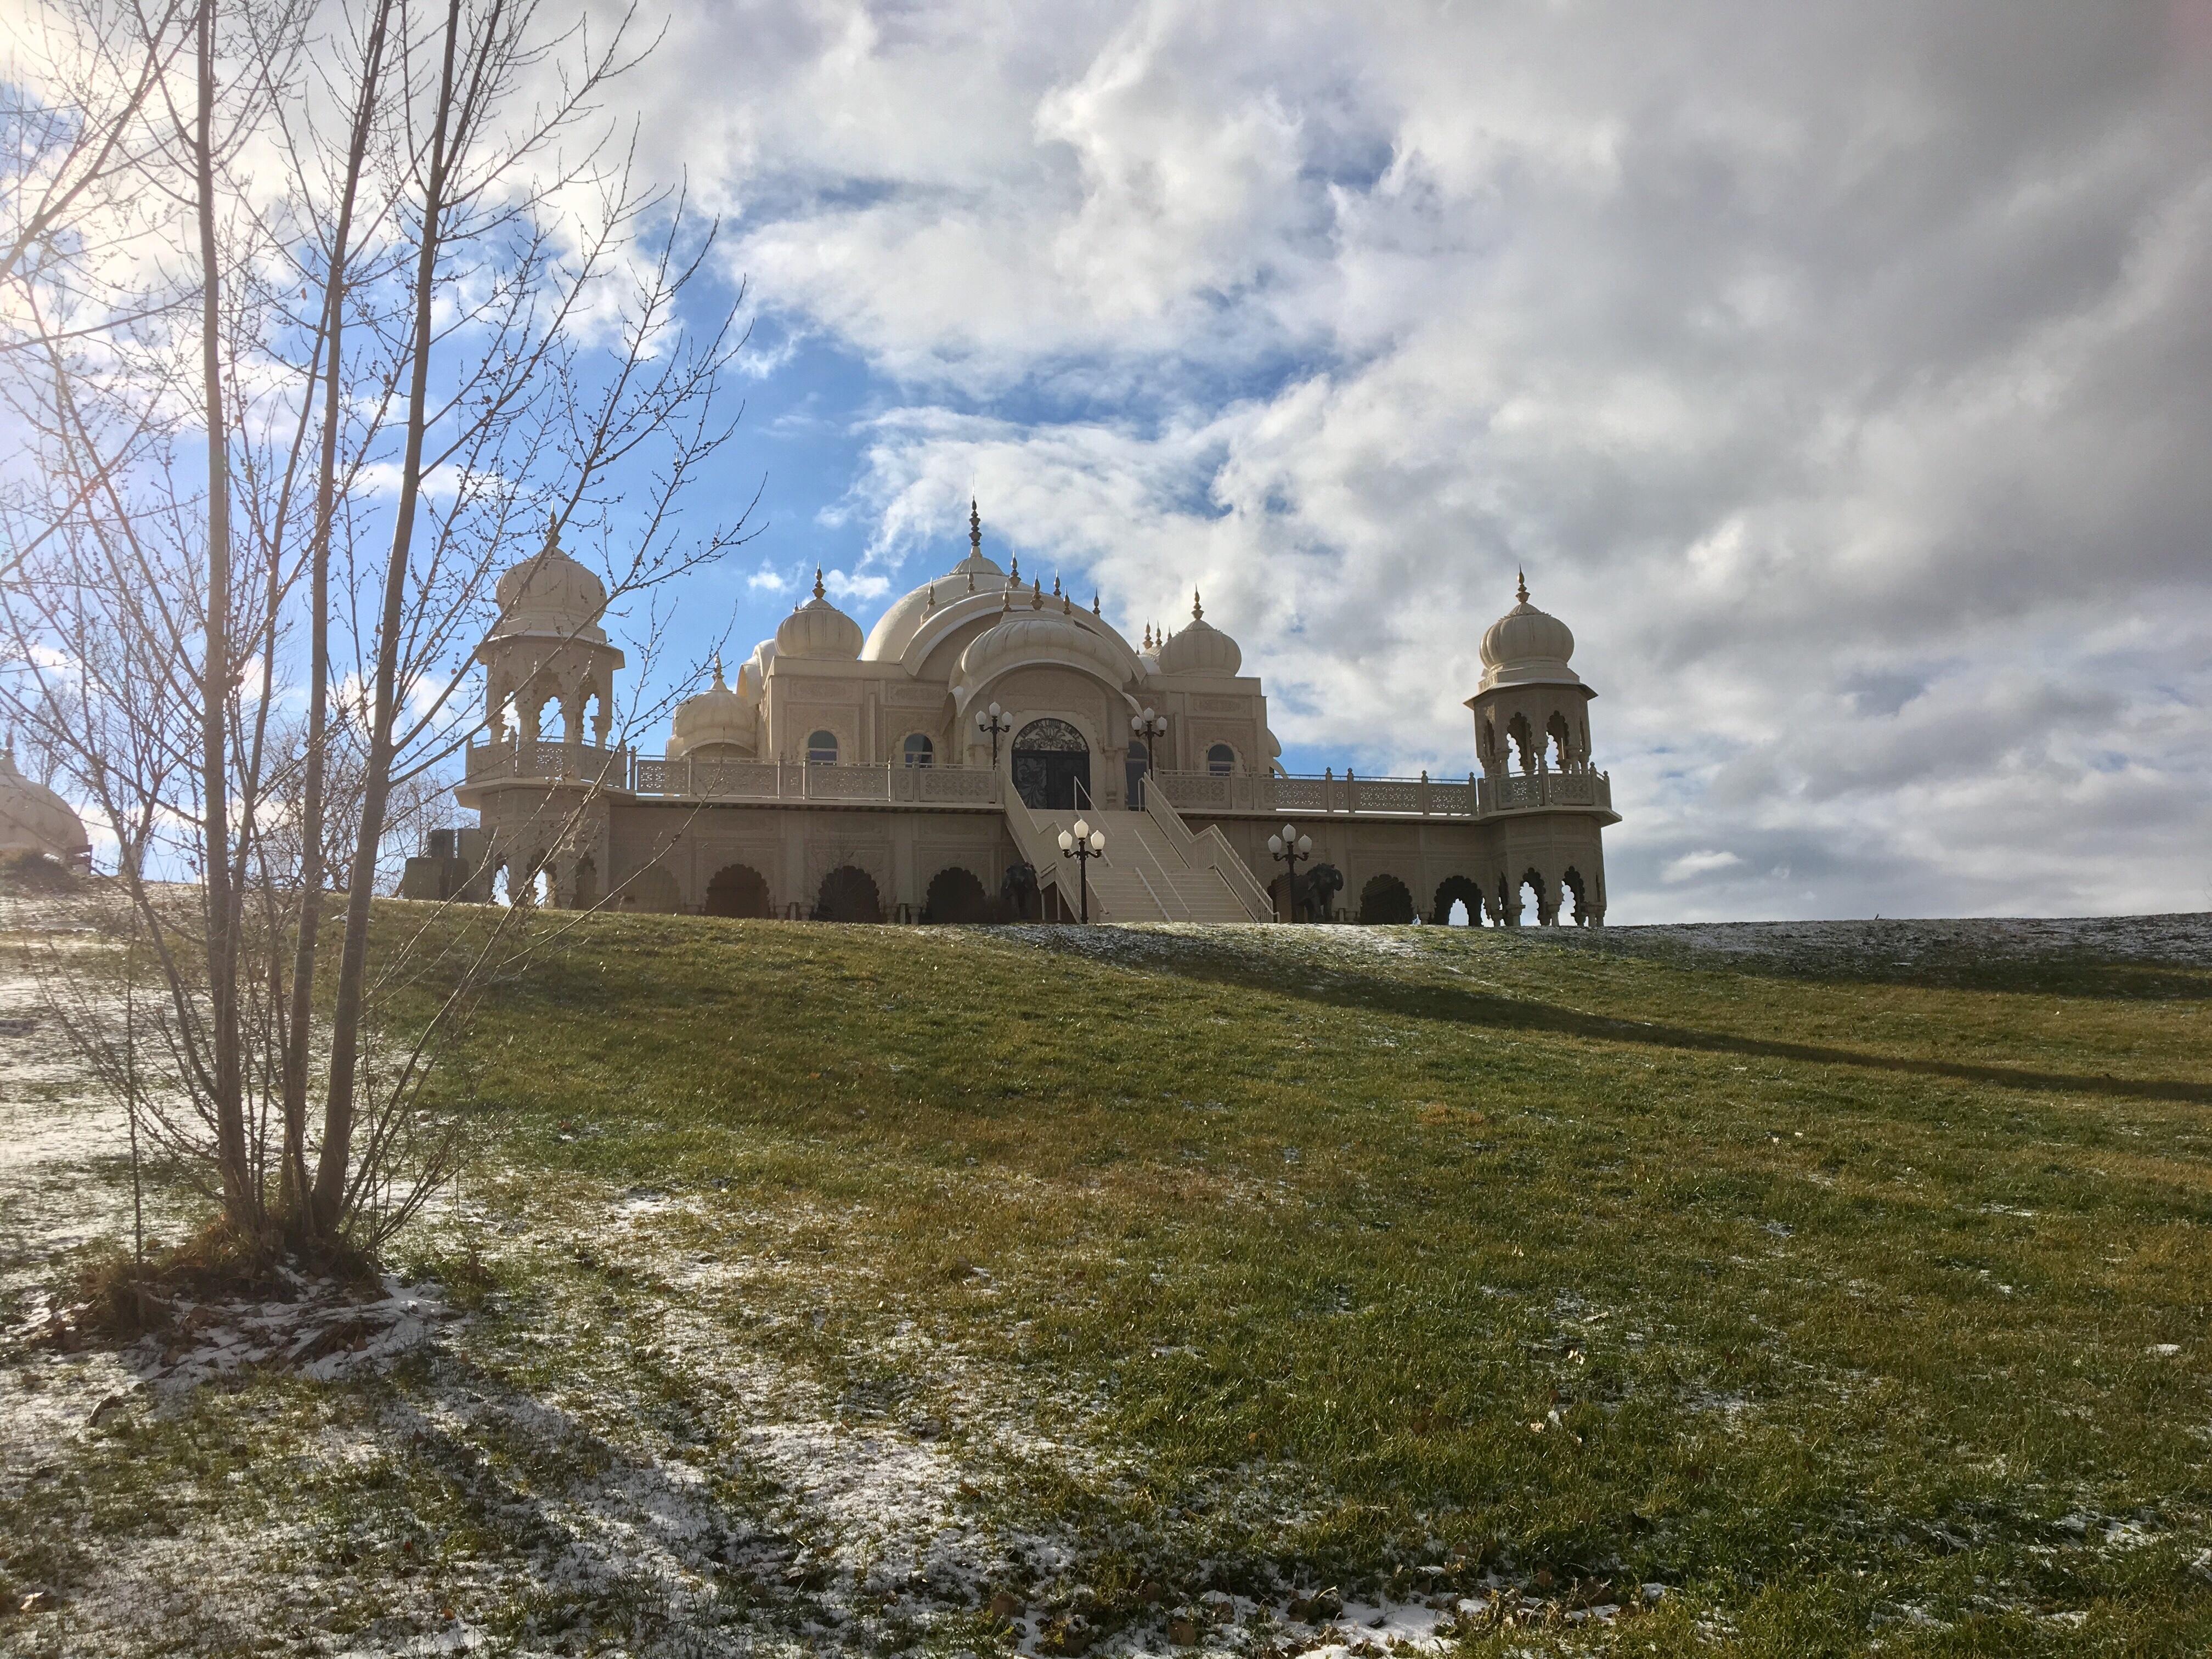 Sri Sri Radha Krishna Temple in Spanish Fork